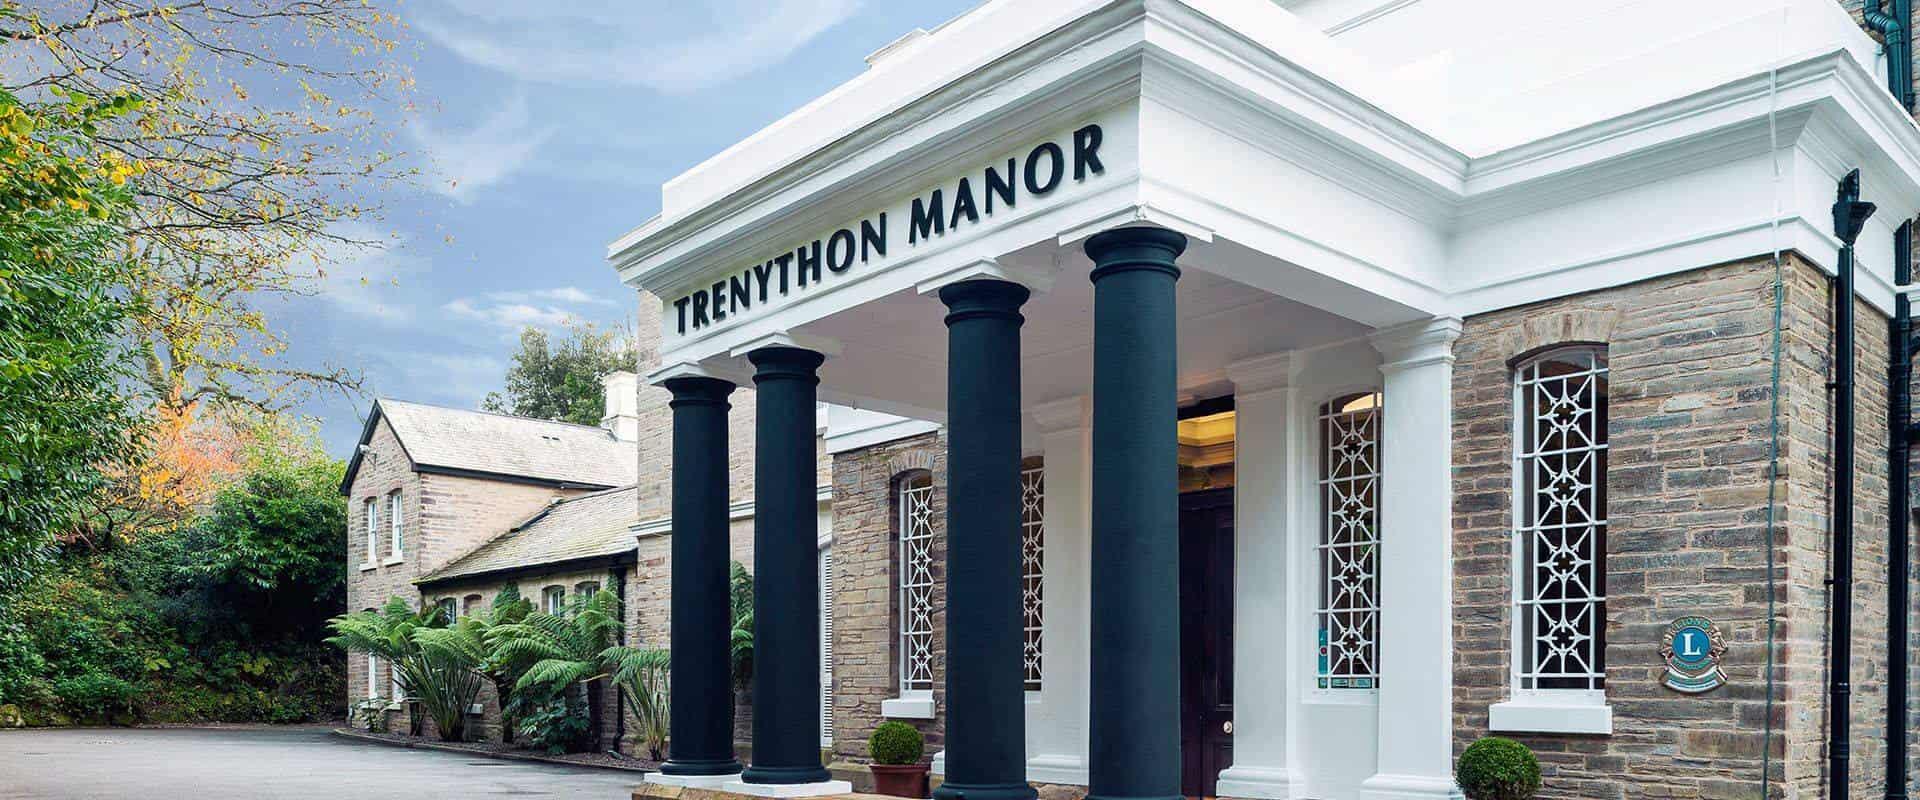 Trenython Manor front